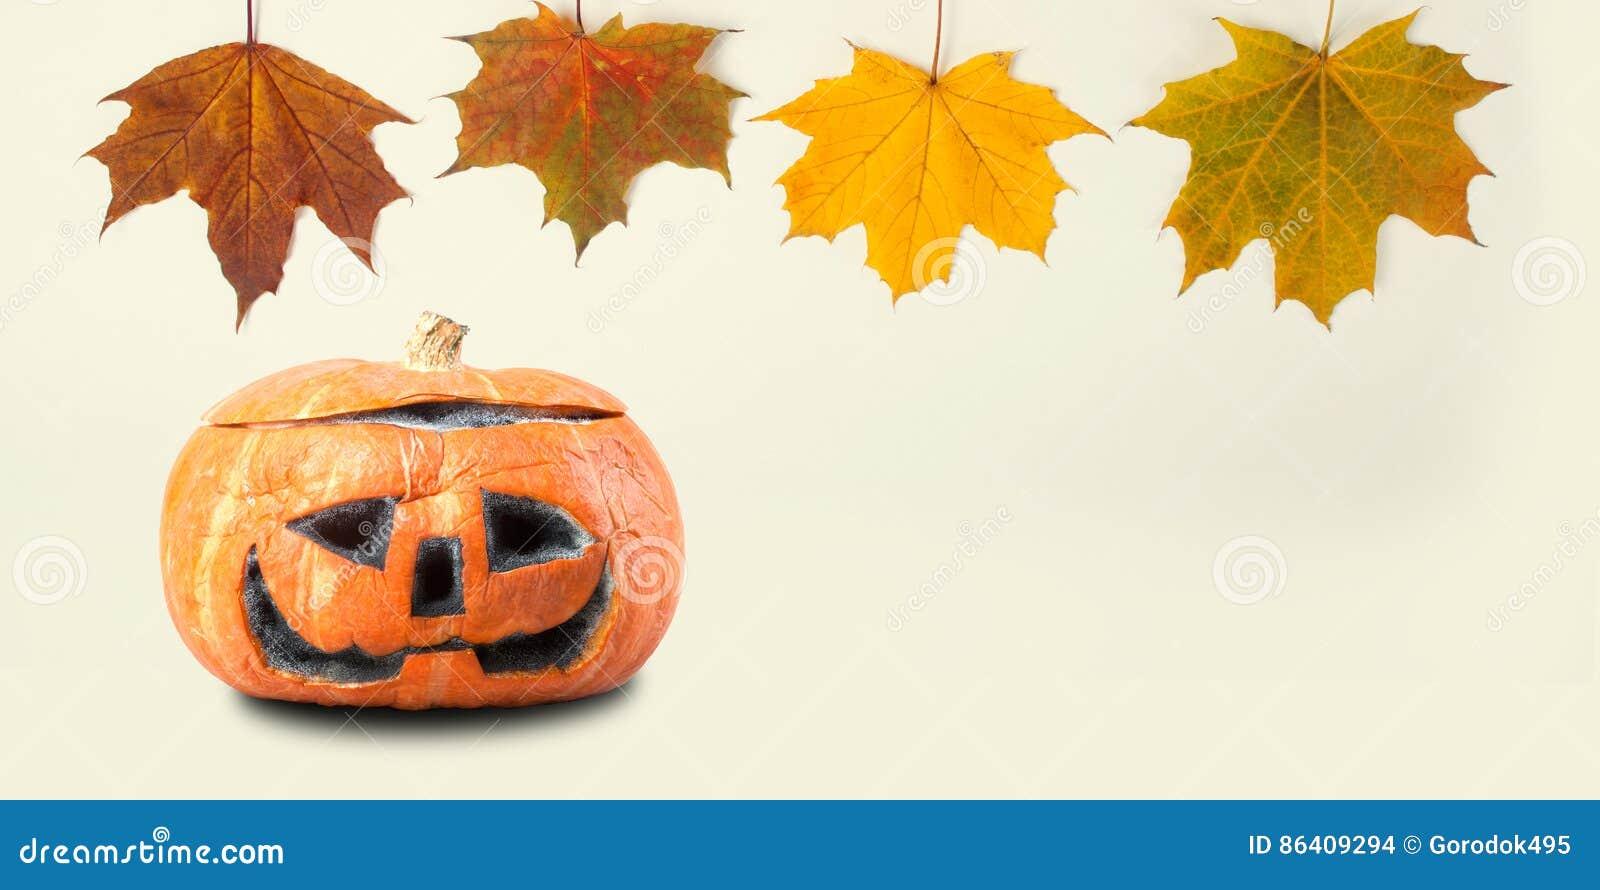 Halloween Decoration Template With Orange Pumpkin Colorful Maple ...